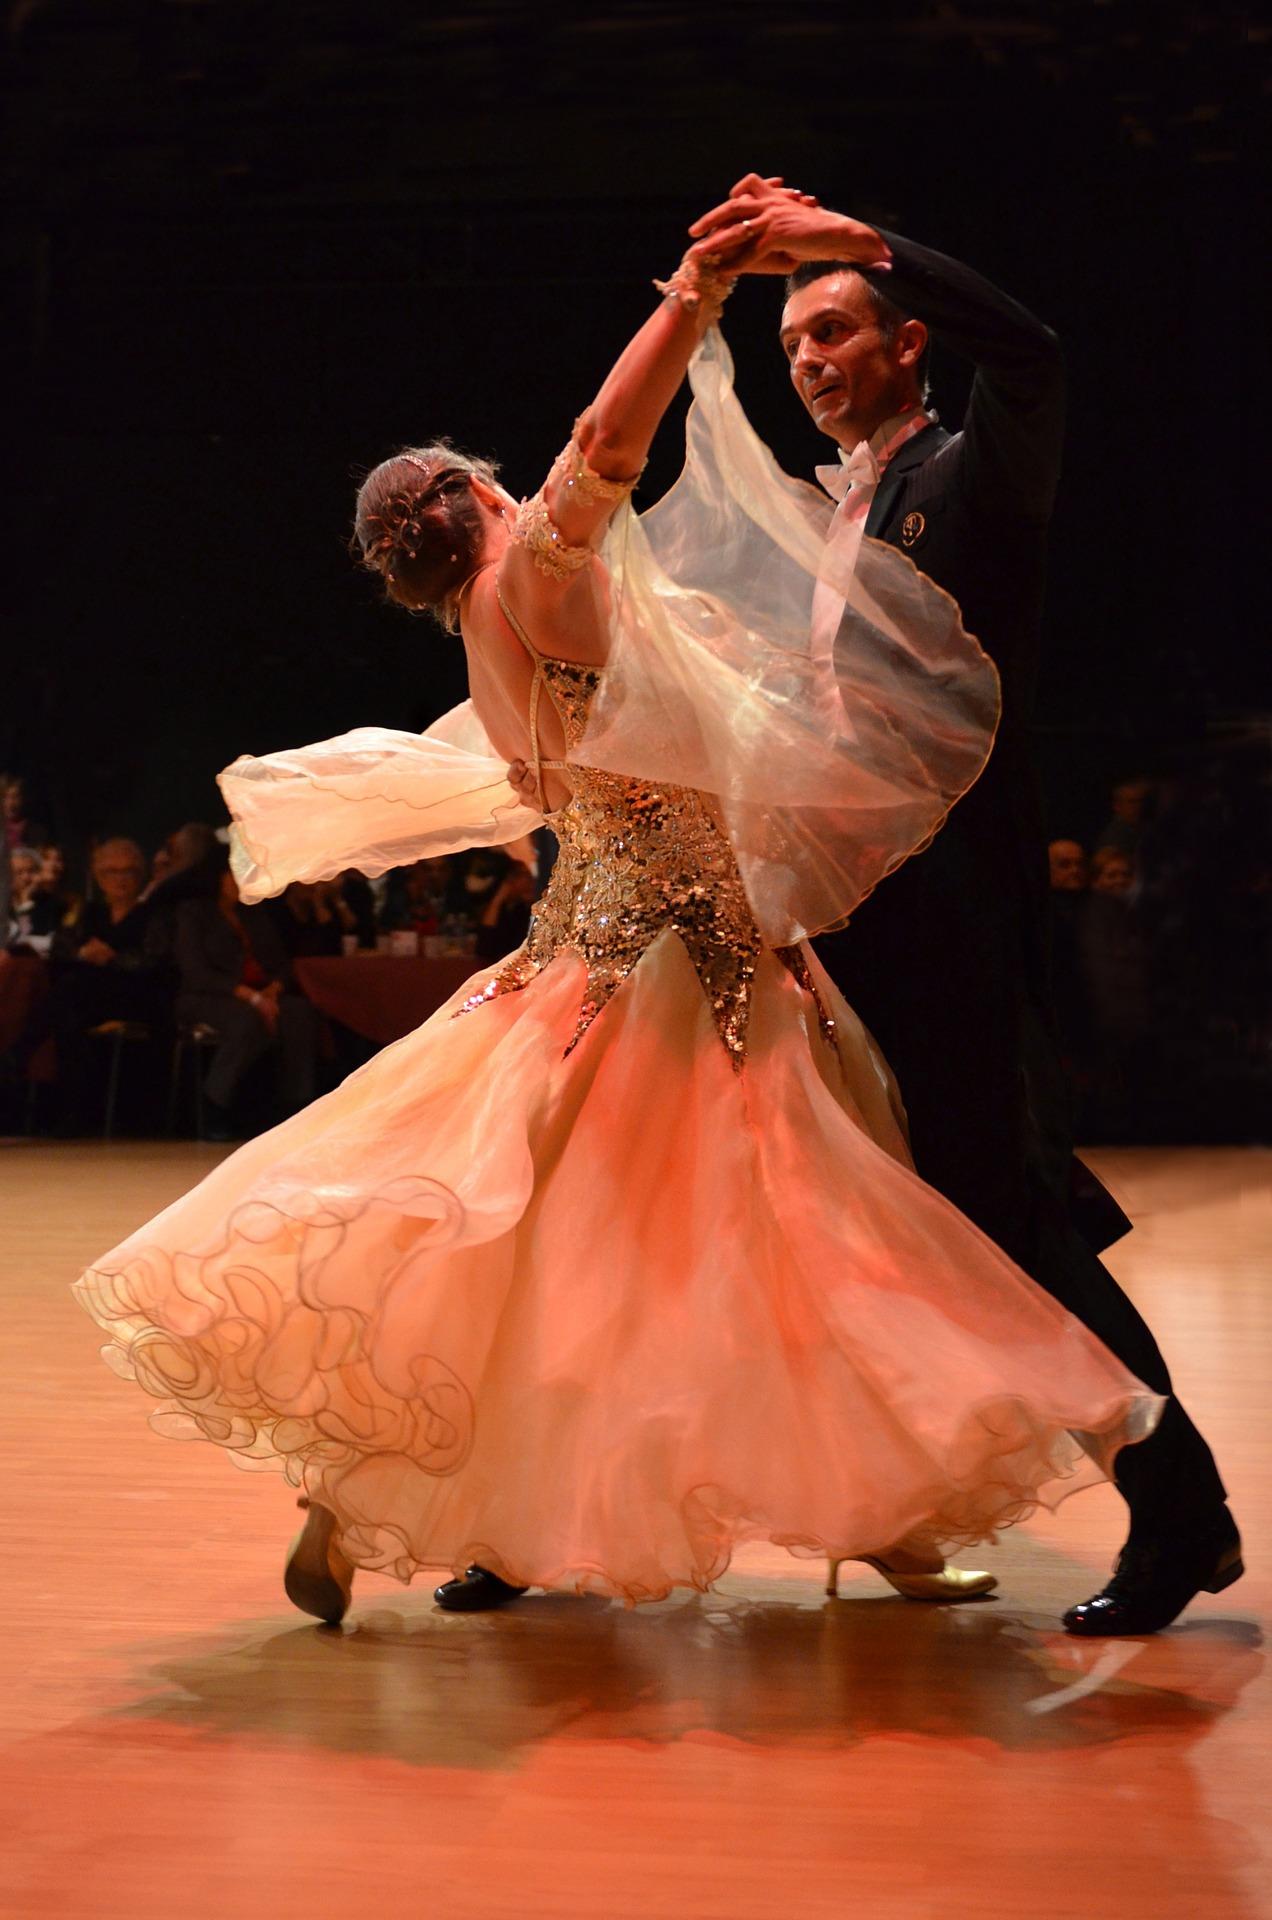 P17_dance-689609_1920